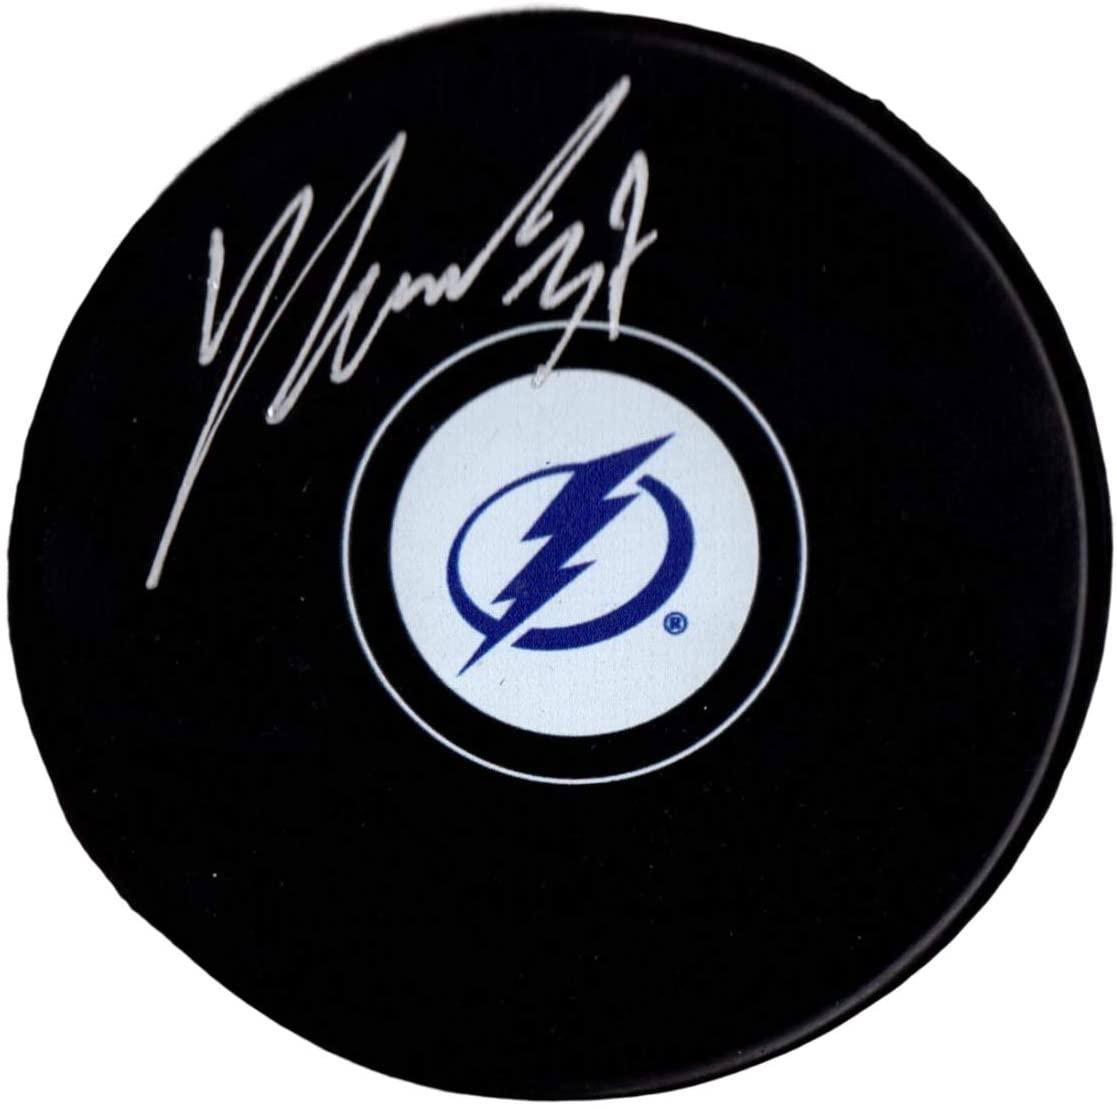 Yanni Gourde autographed signed puck NHL Tampa Bay Lightning PSA COA